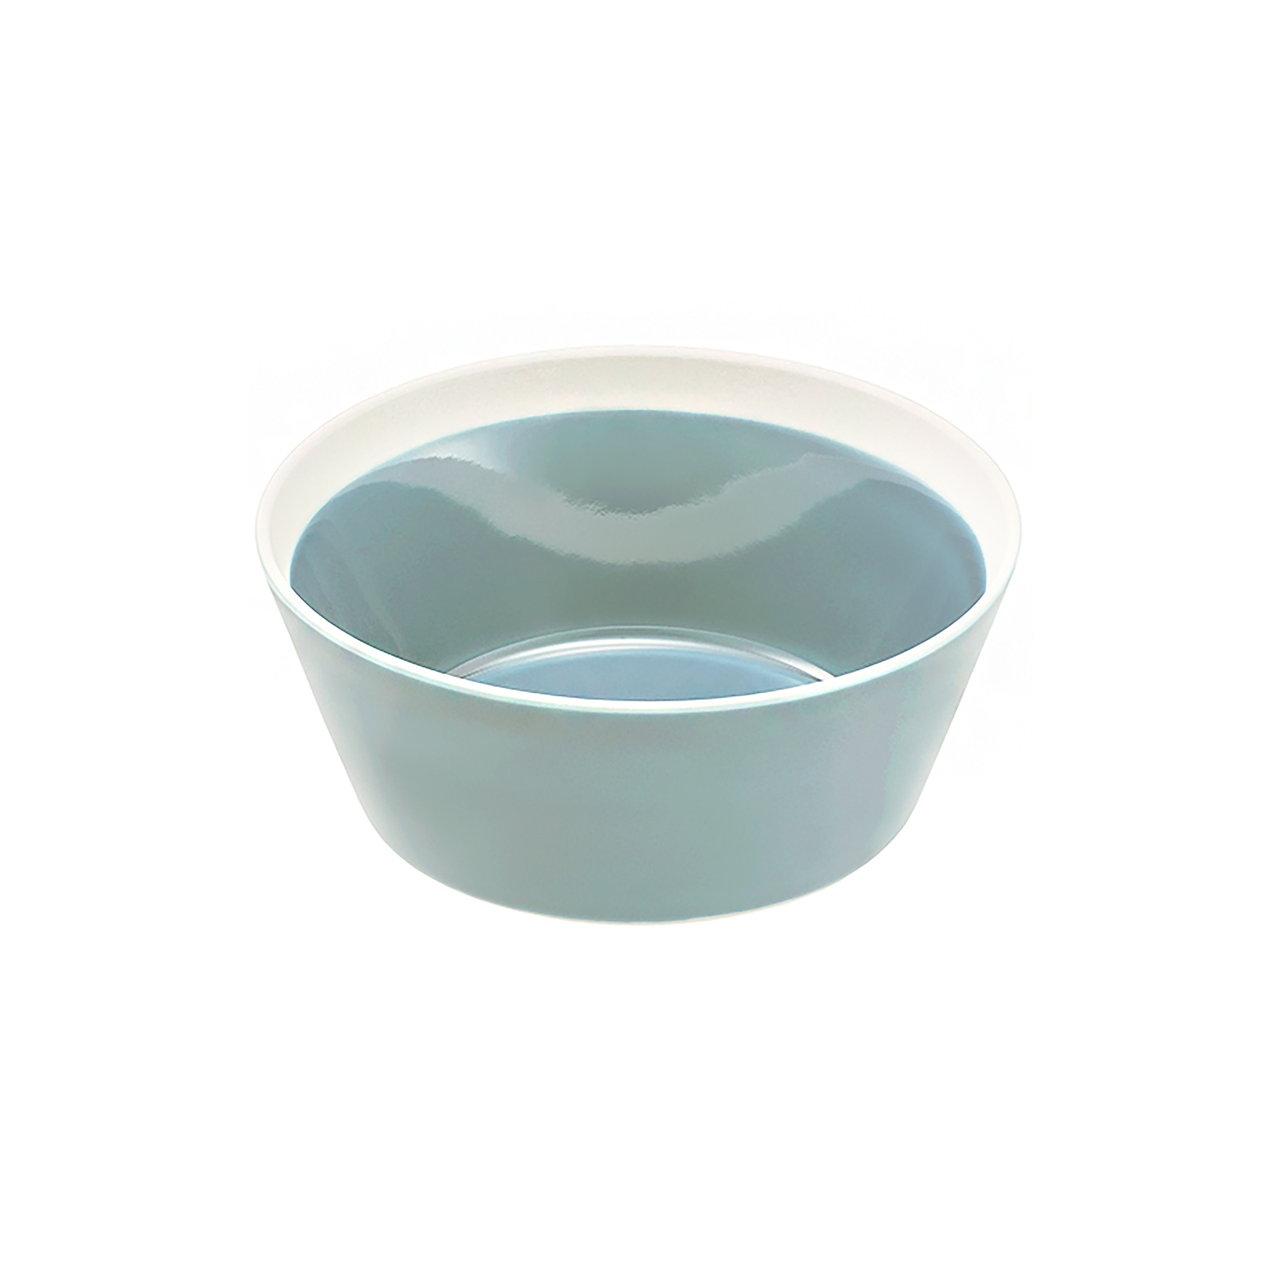 yumiko iihoshi porcelain(ユミコイイホシポーセリン)×木村硝子店 dishes bowl S (pistachio green)  ボウル 鉢 約高さ5×口径12.5cm 日本製 255251